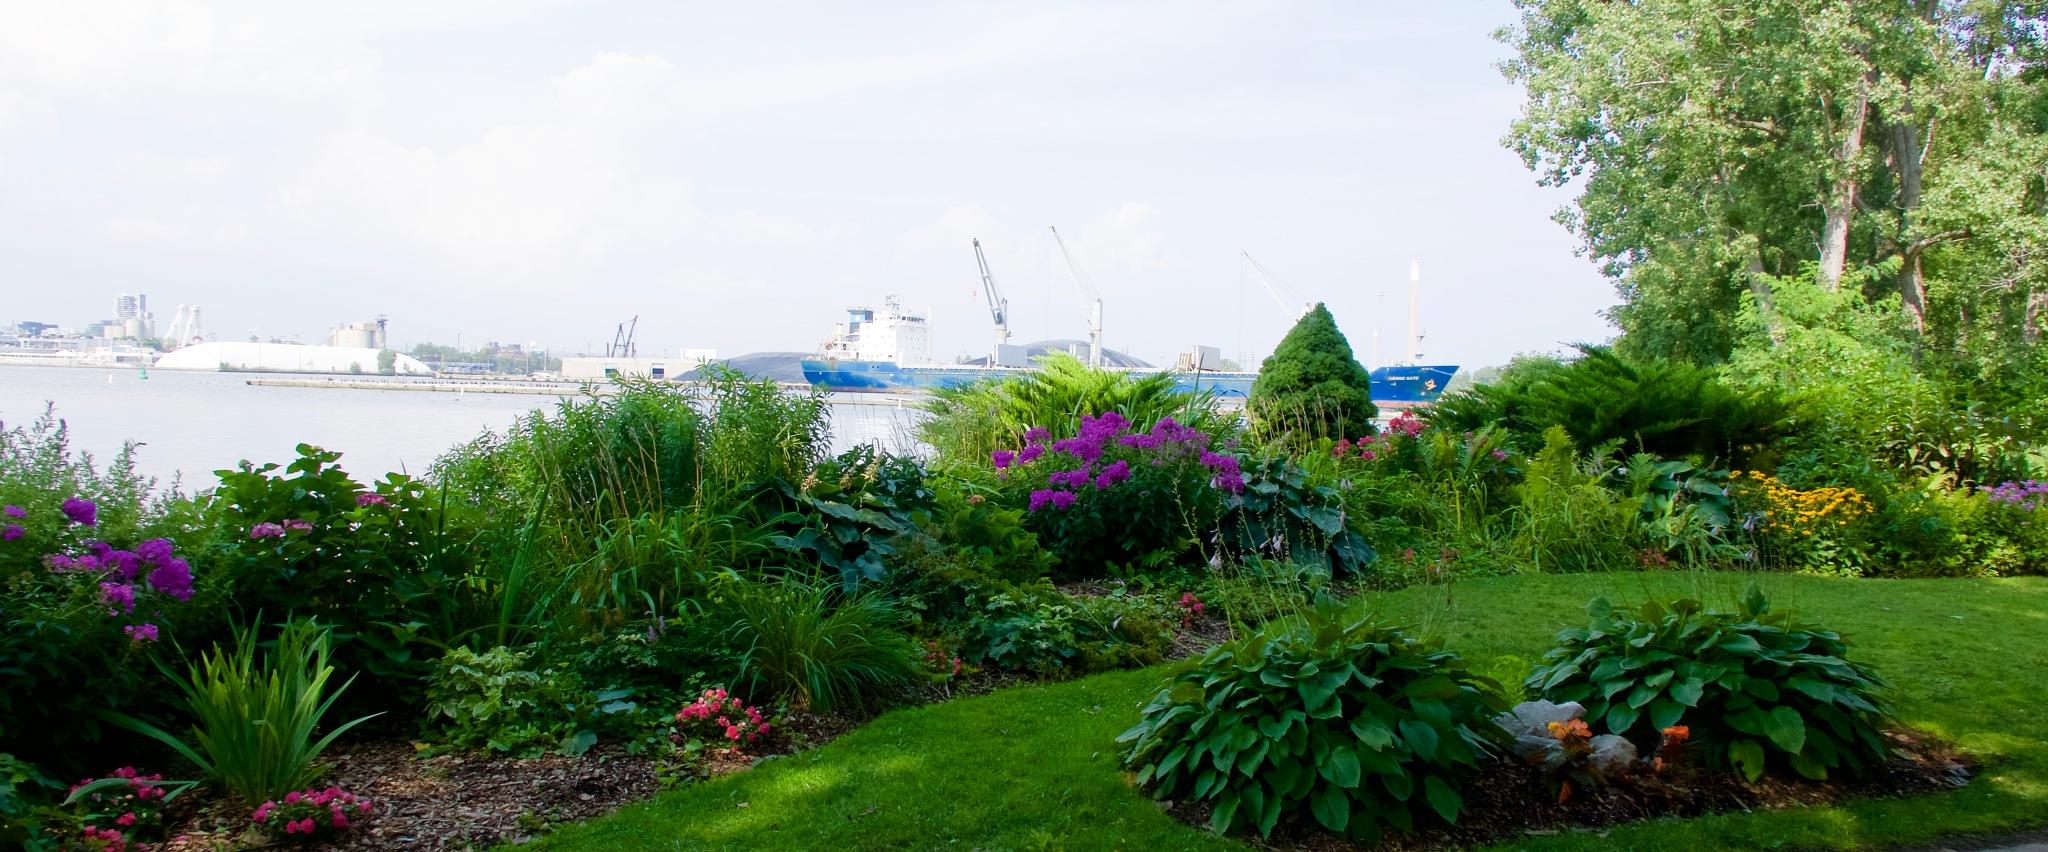 Gardens of Ward's Island by Karen Bekker